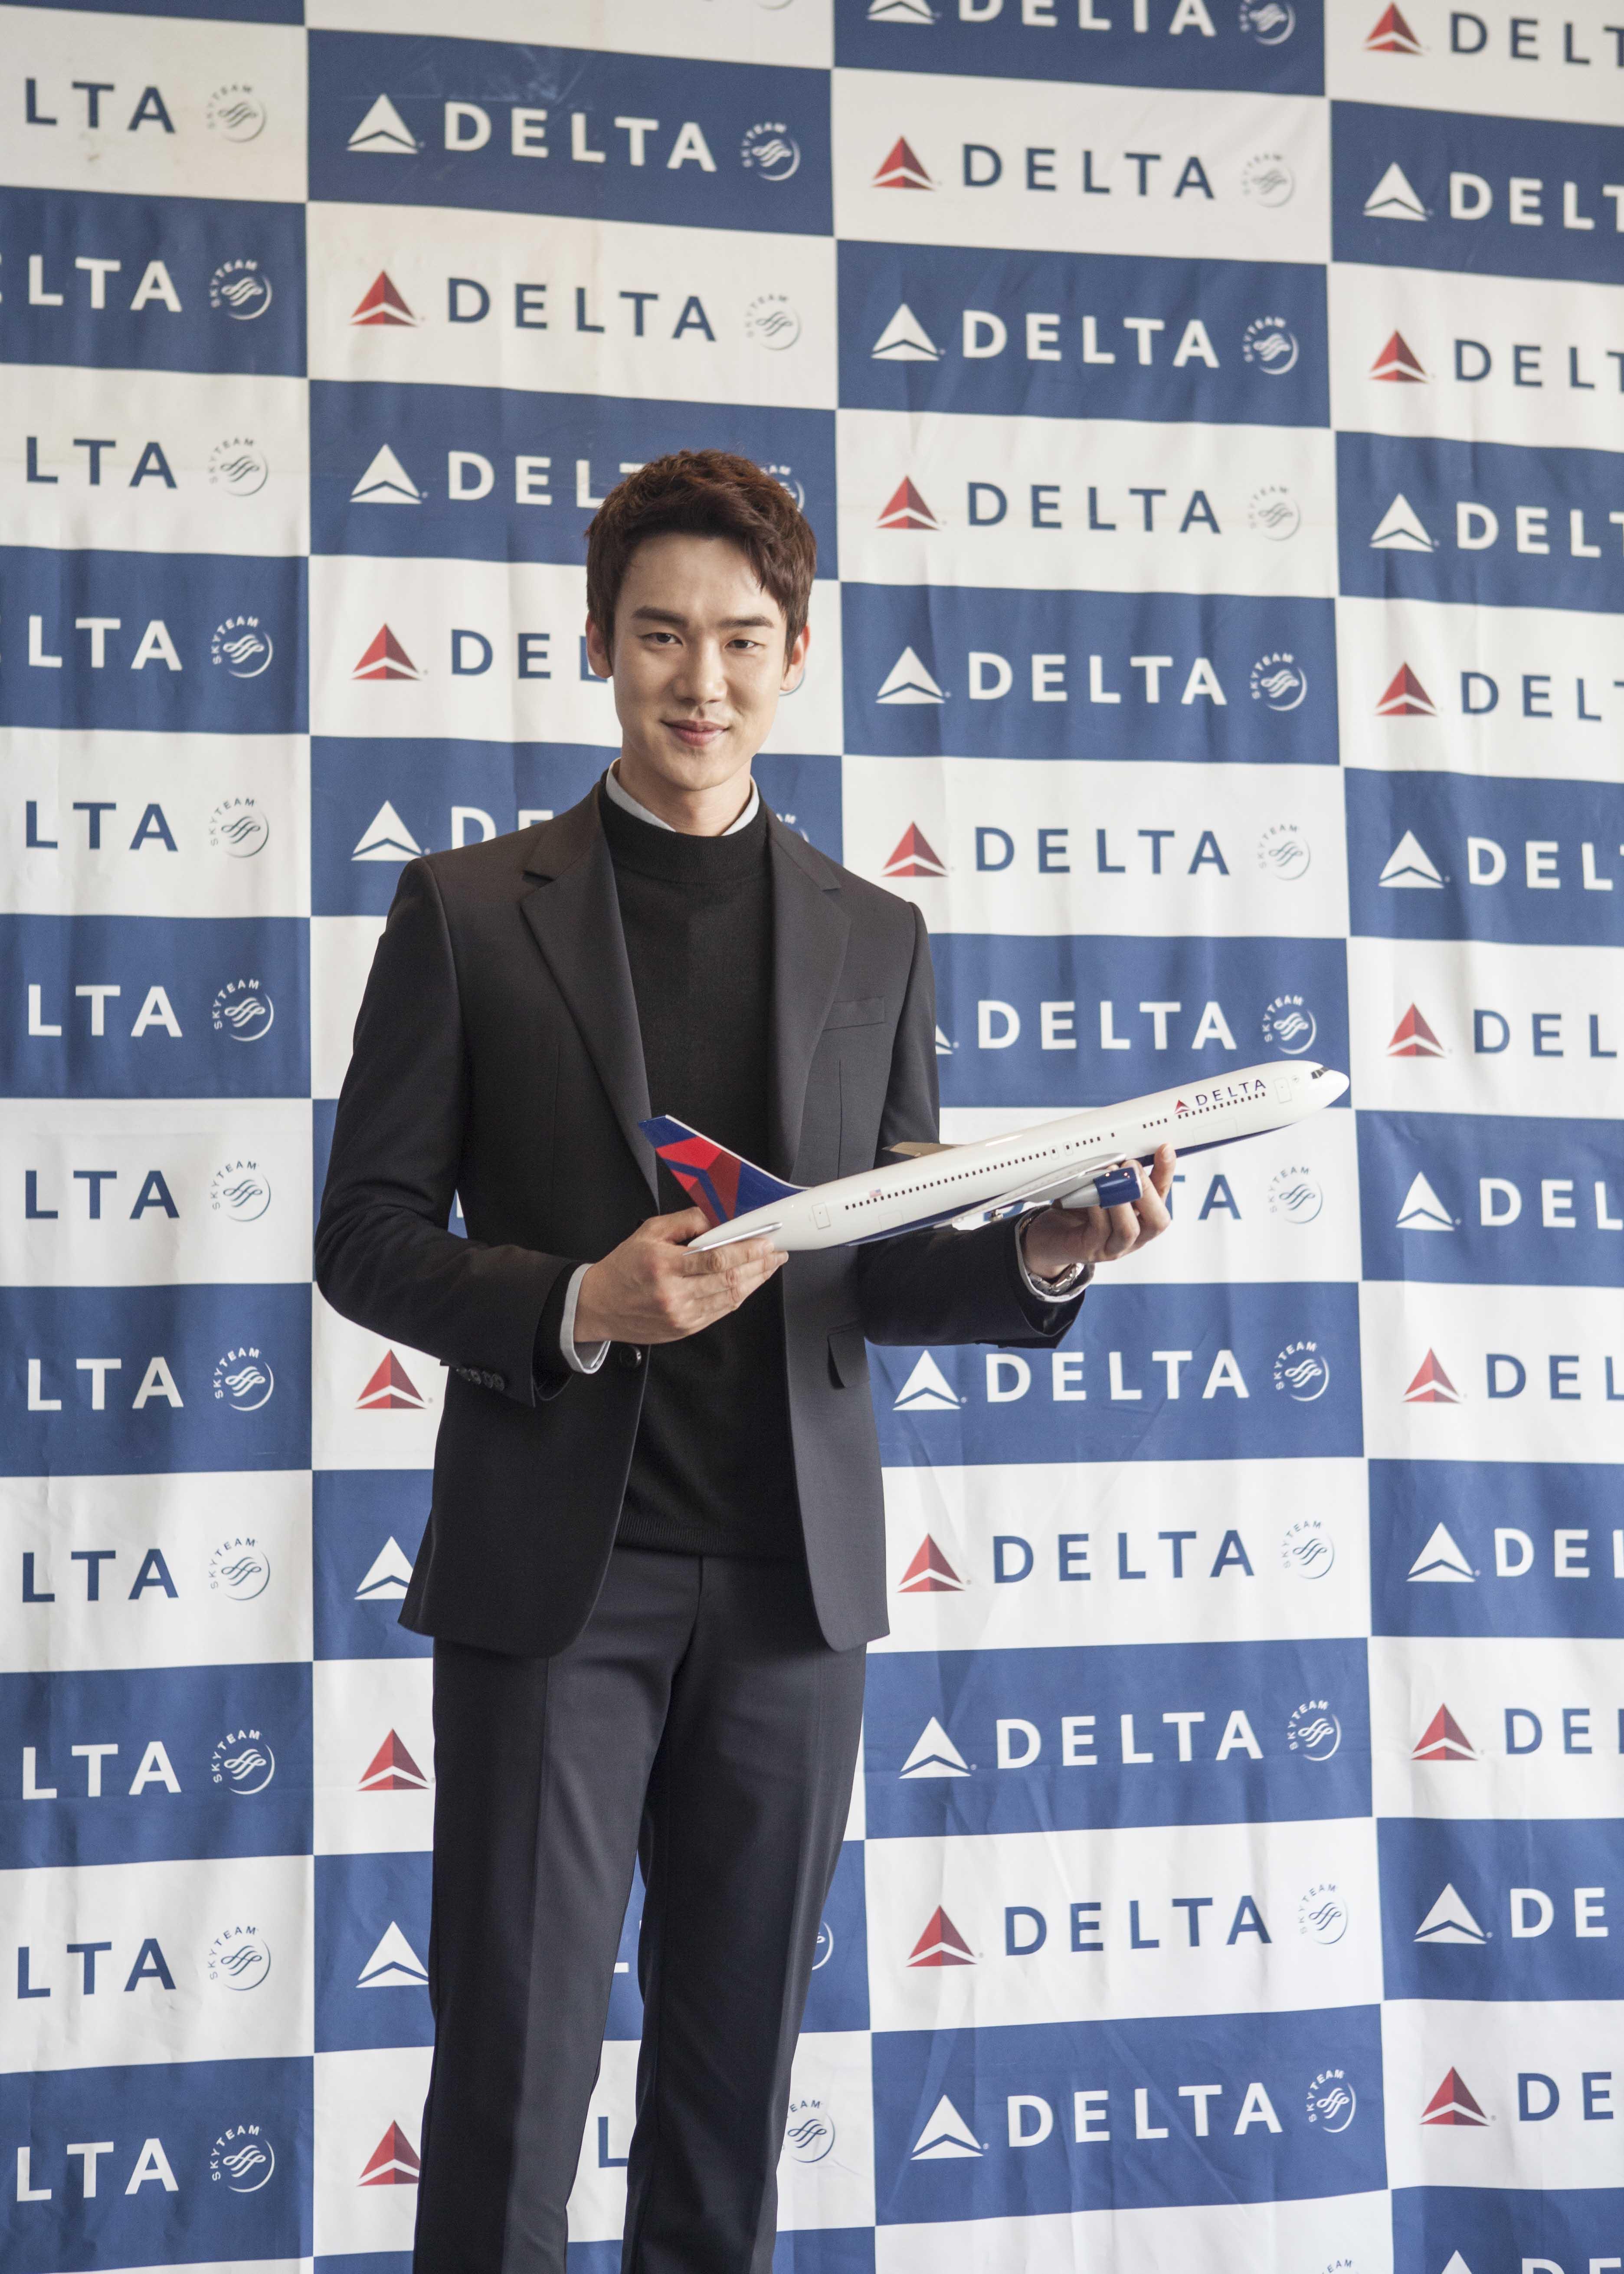 Korean Man holding airplane model